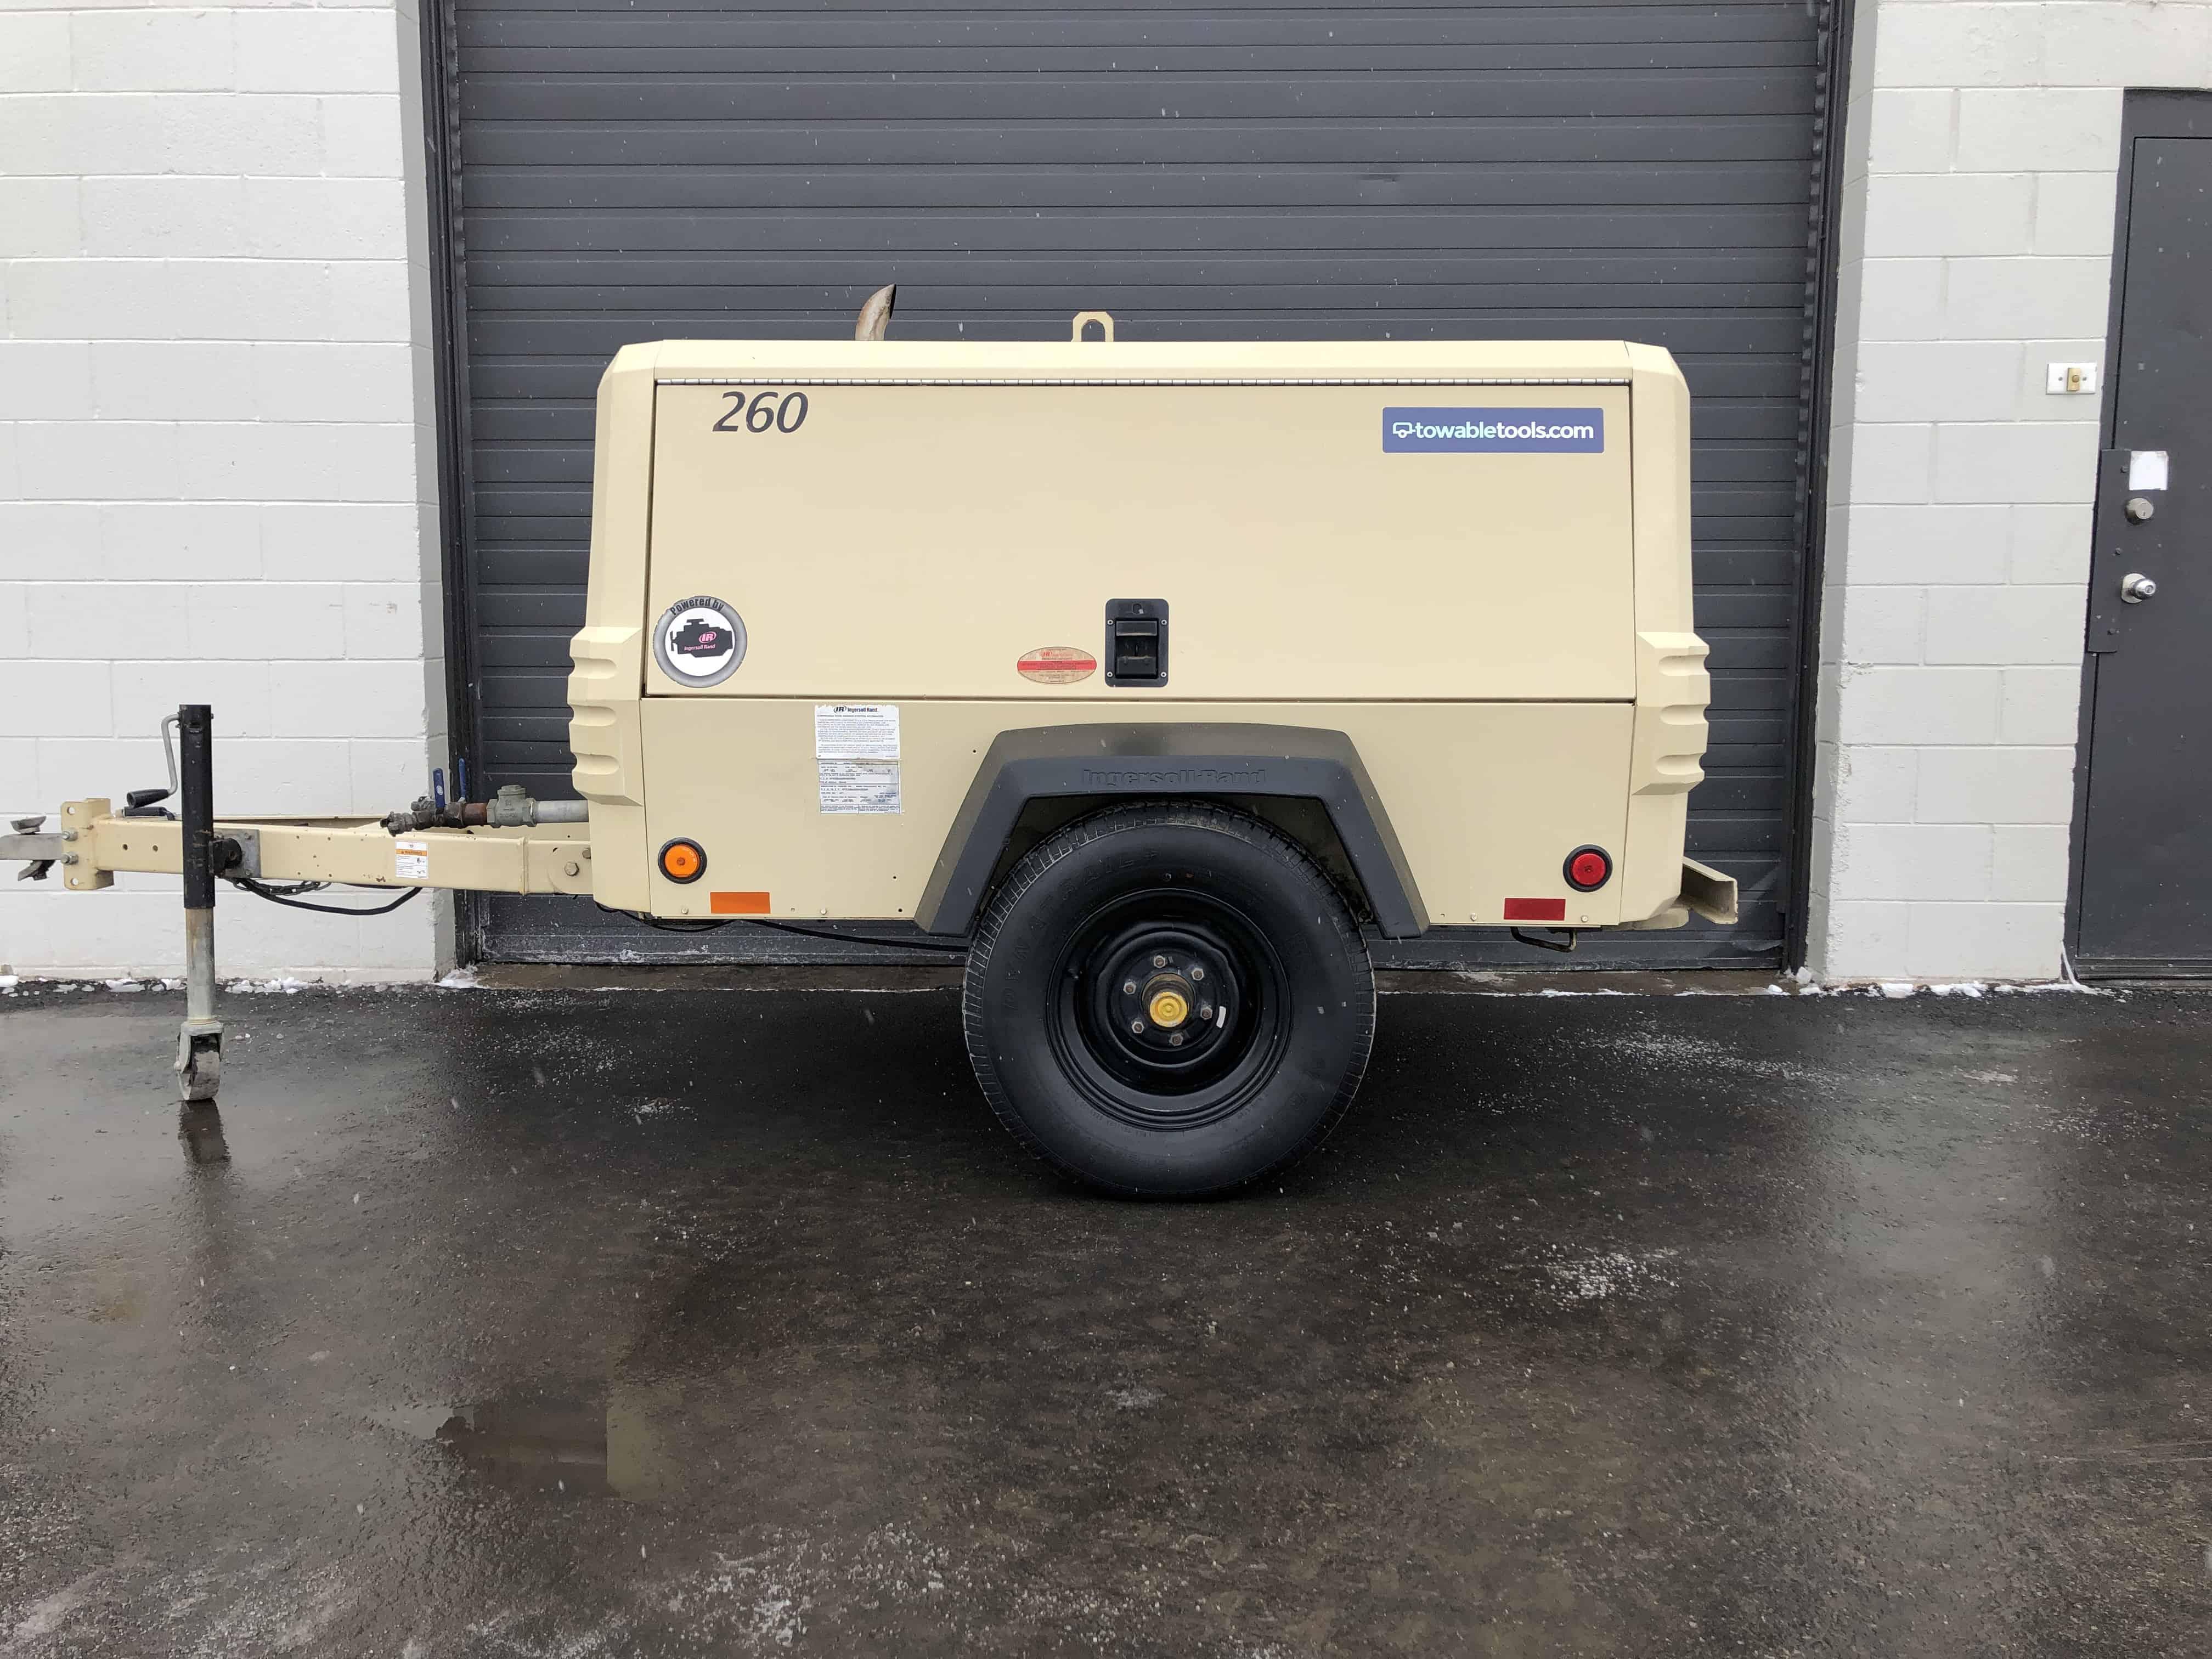 260 CFM Air Compressor For Sale, Used Doosan P260 at Towable Tools Alberta